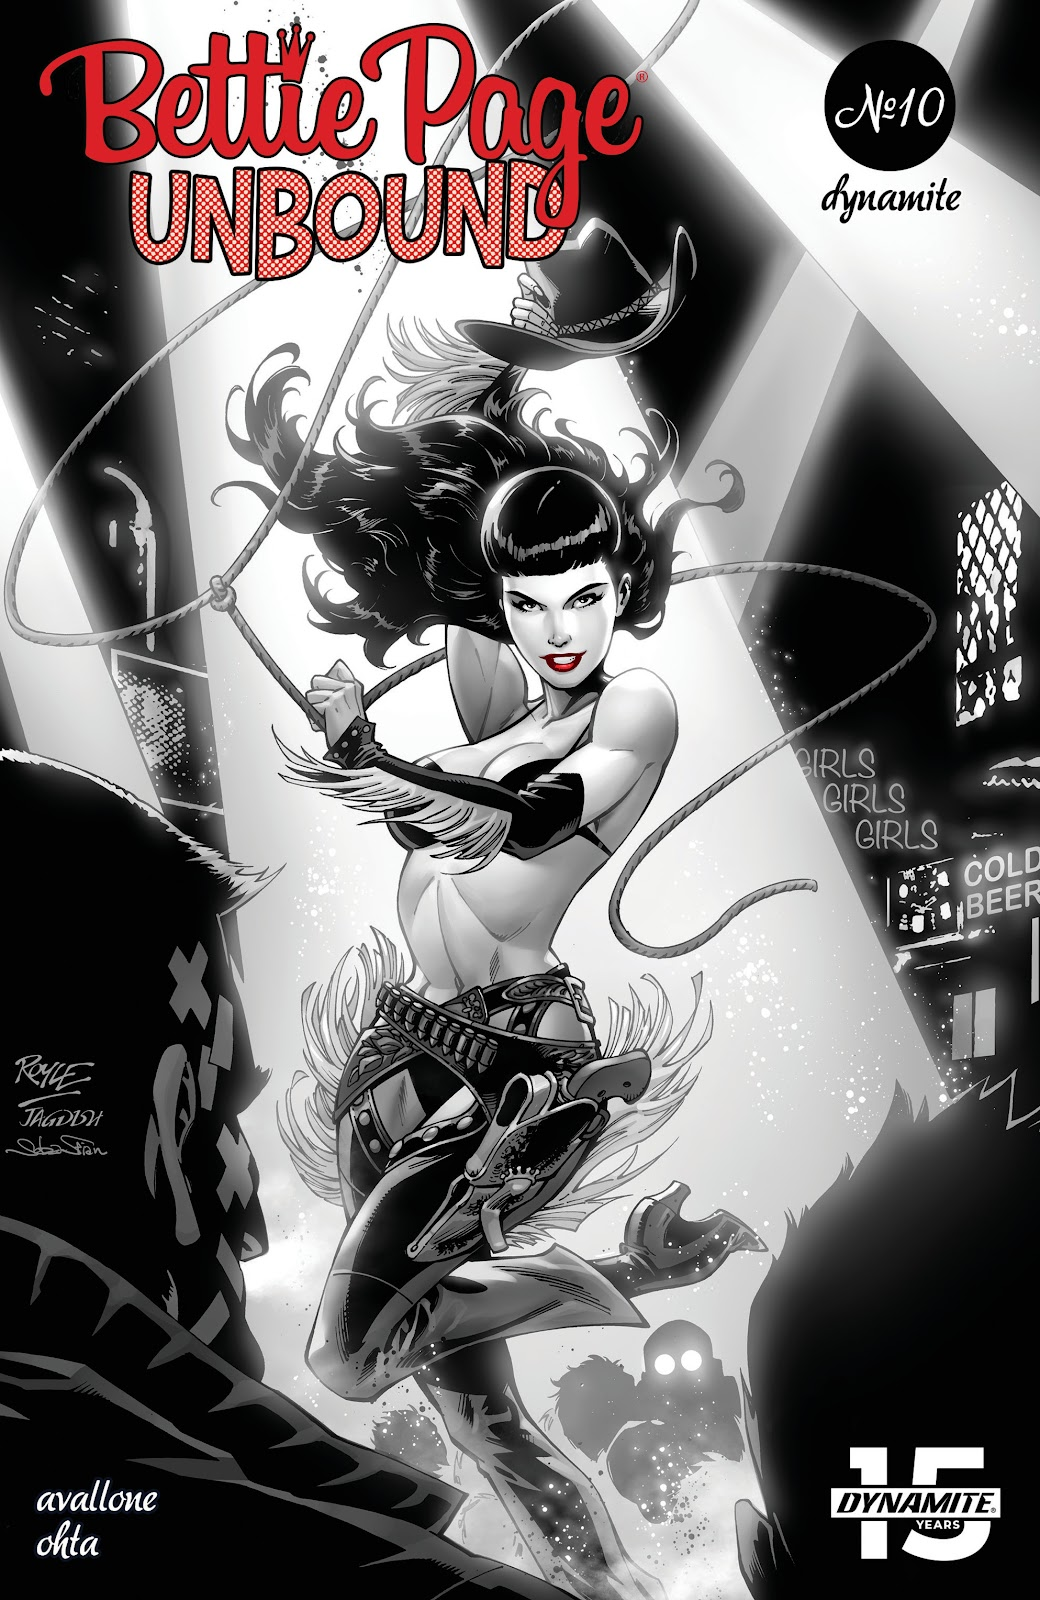 Read online Bettie Page: Unbound comic -  Issue #10 - 1